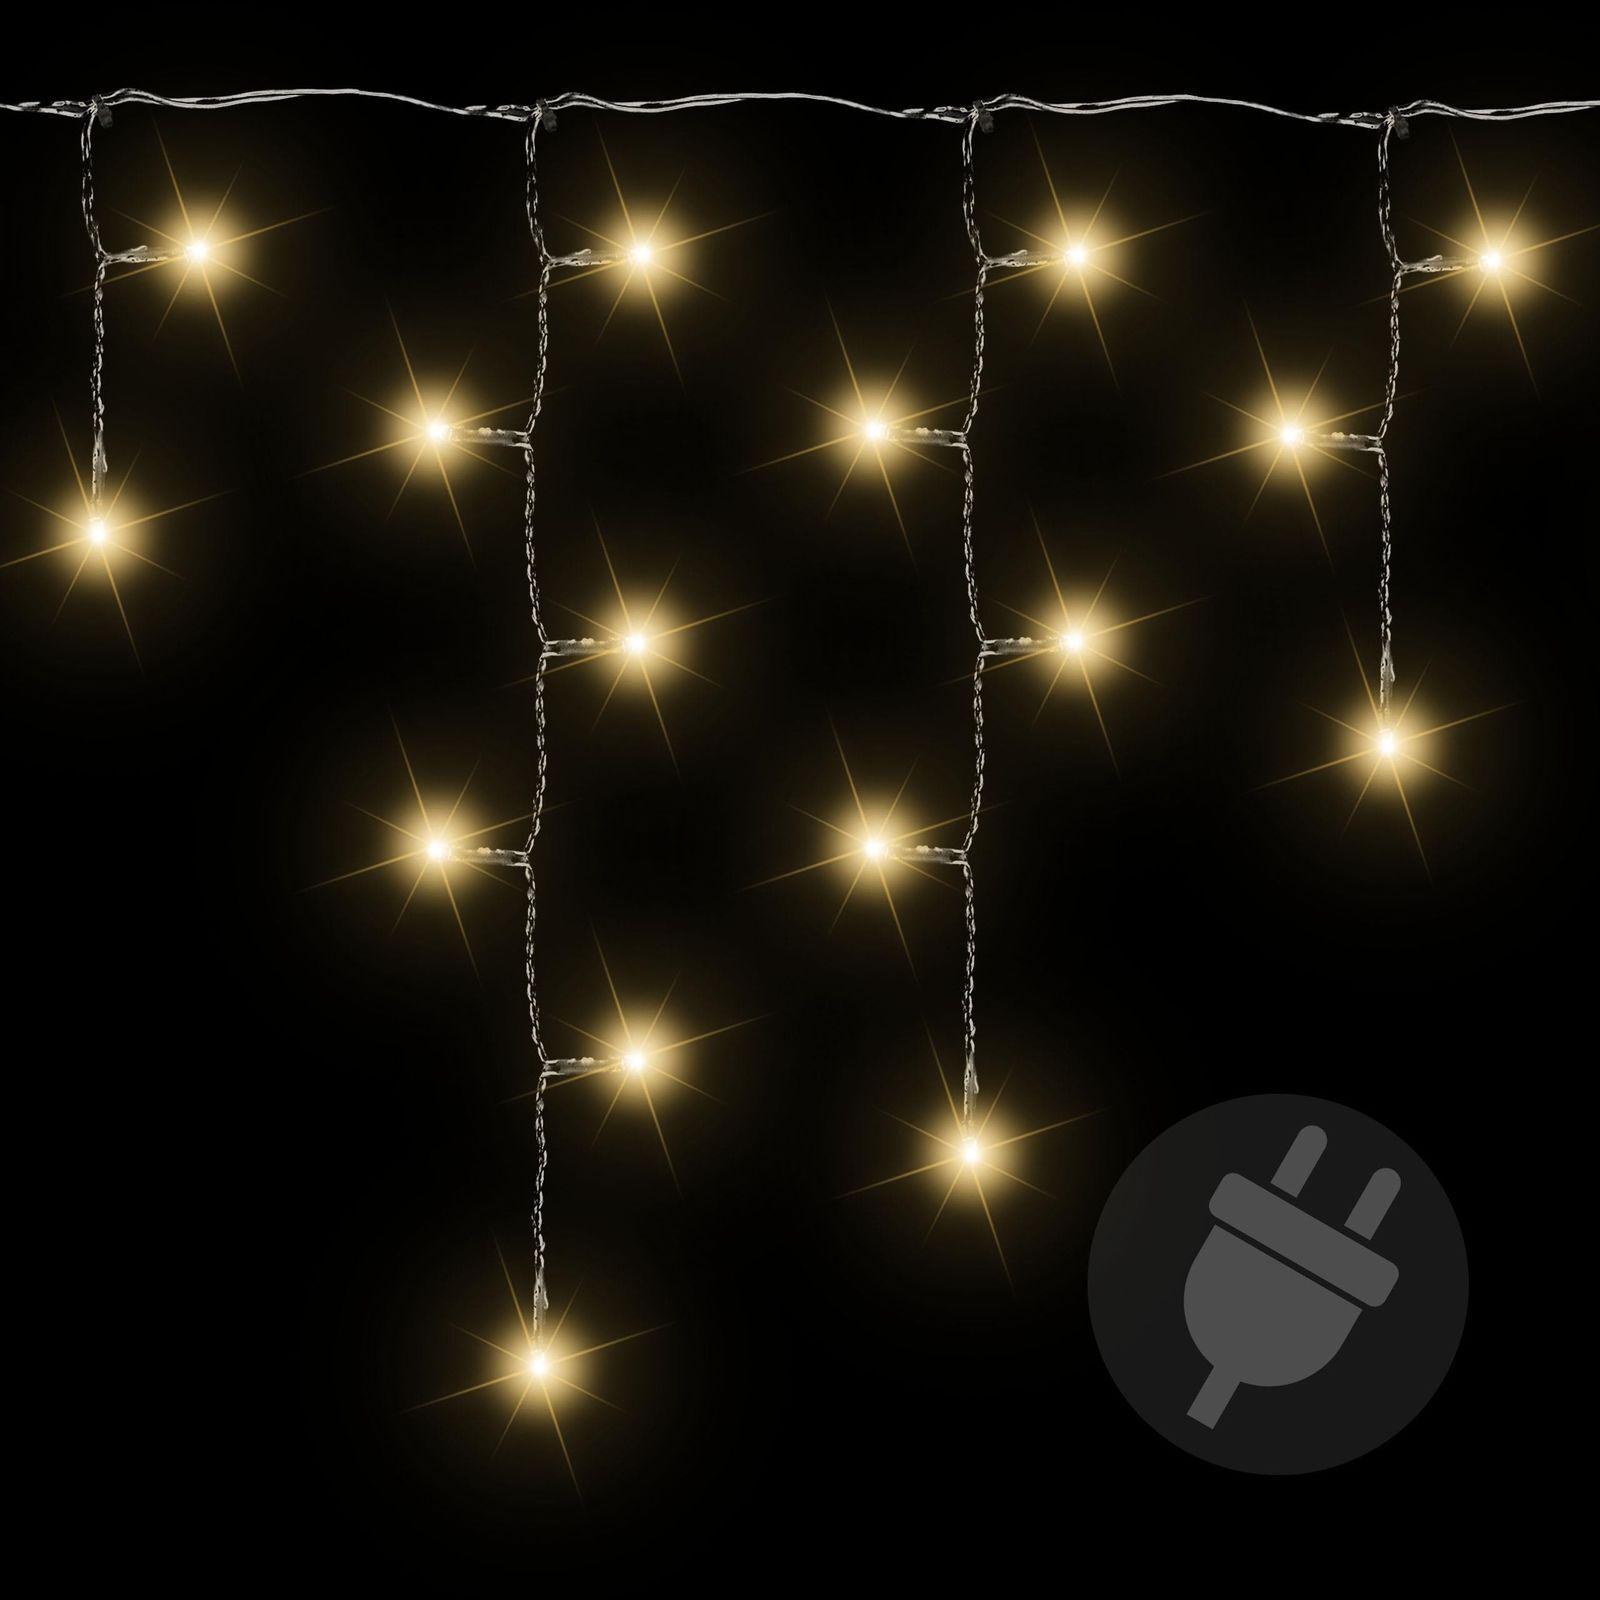 600er cadena luces LED engelante simplón blancooo cálido exterior